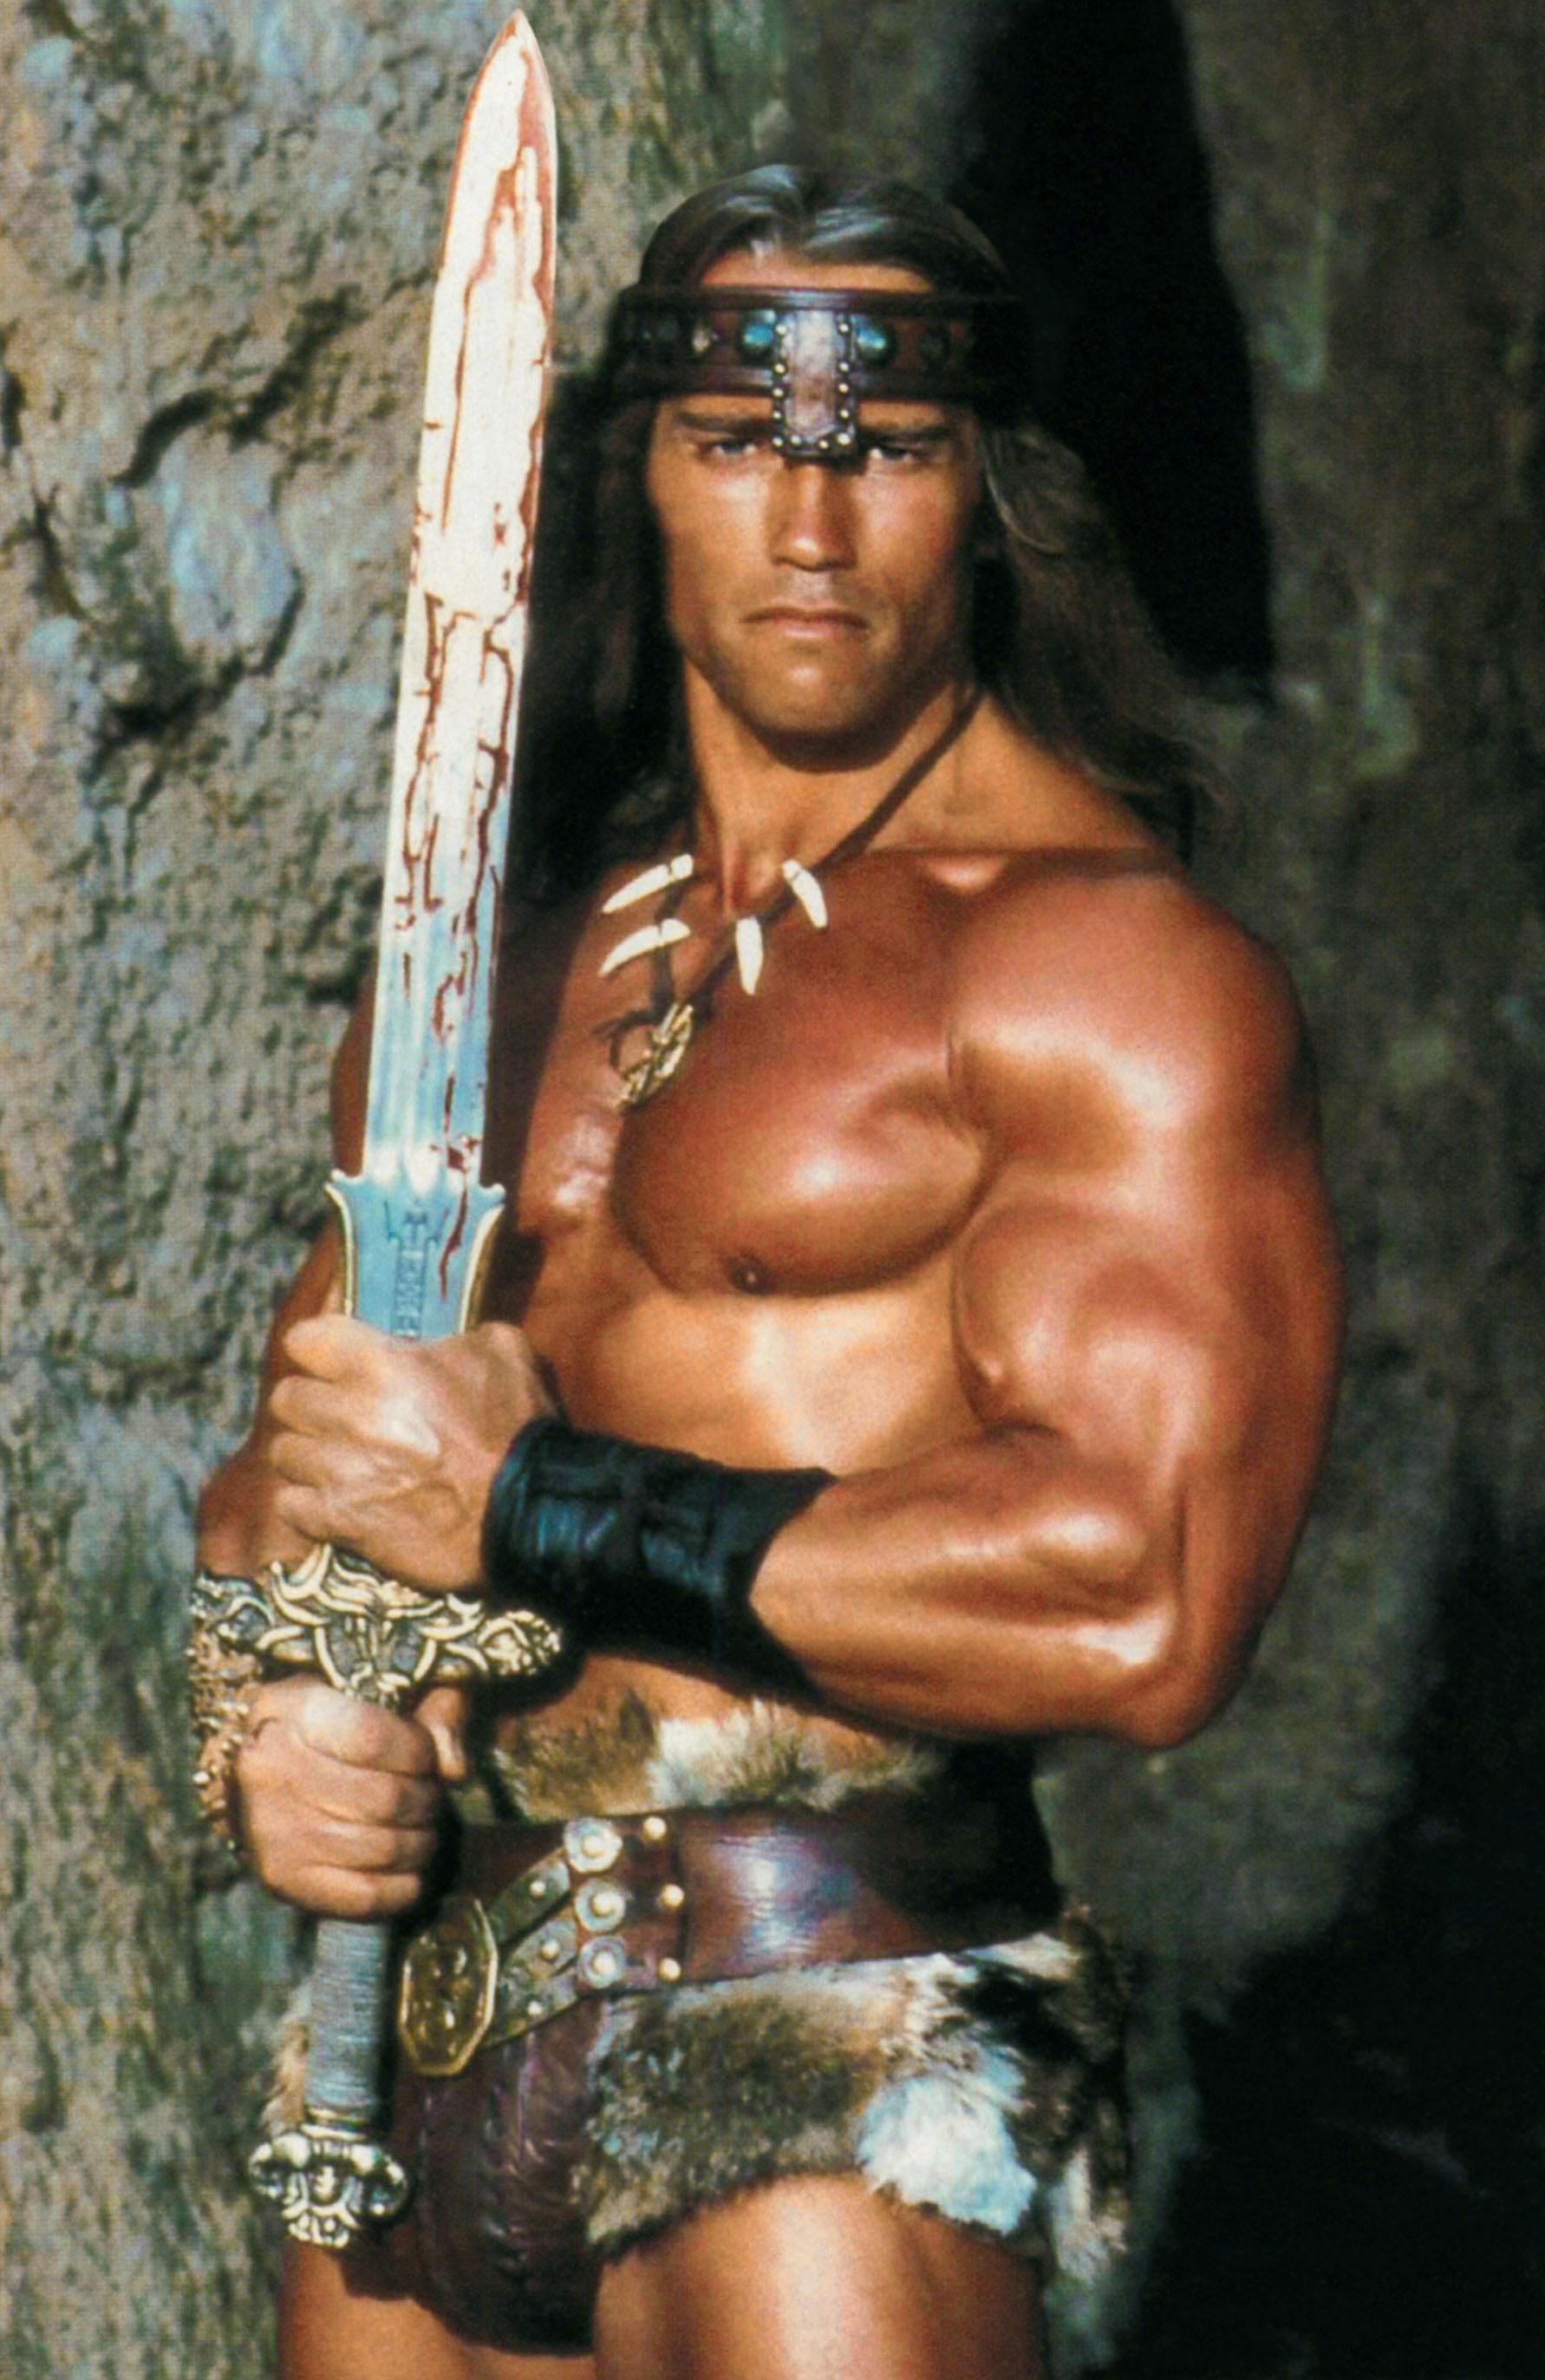 Conan 2011 Delightful conan the barbarian   it's a thrall world